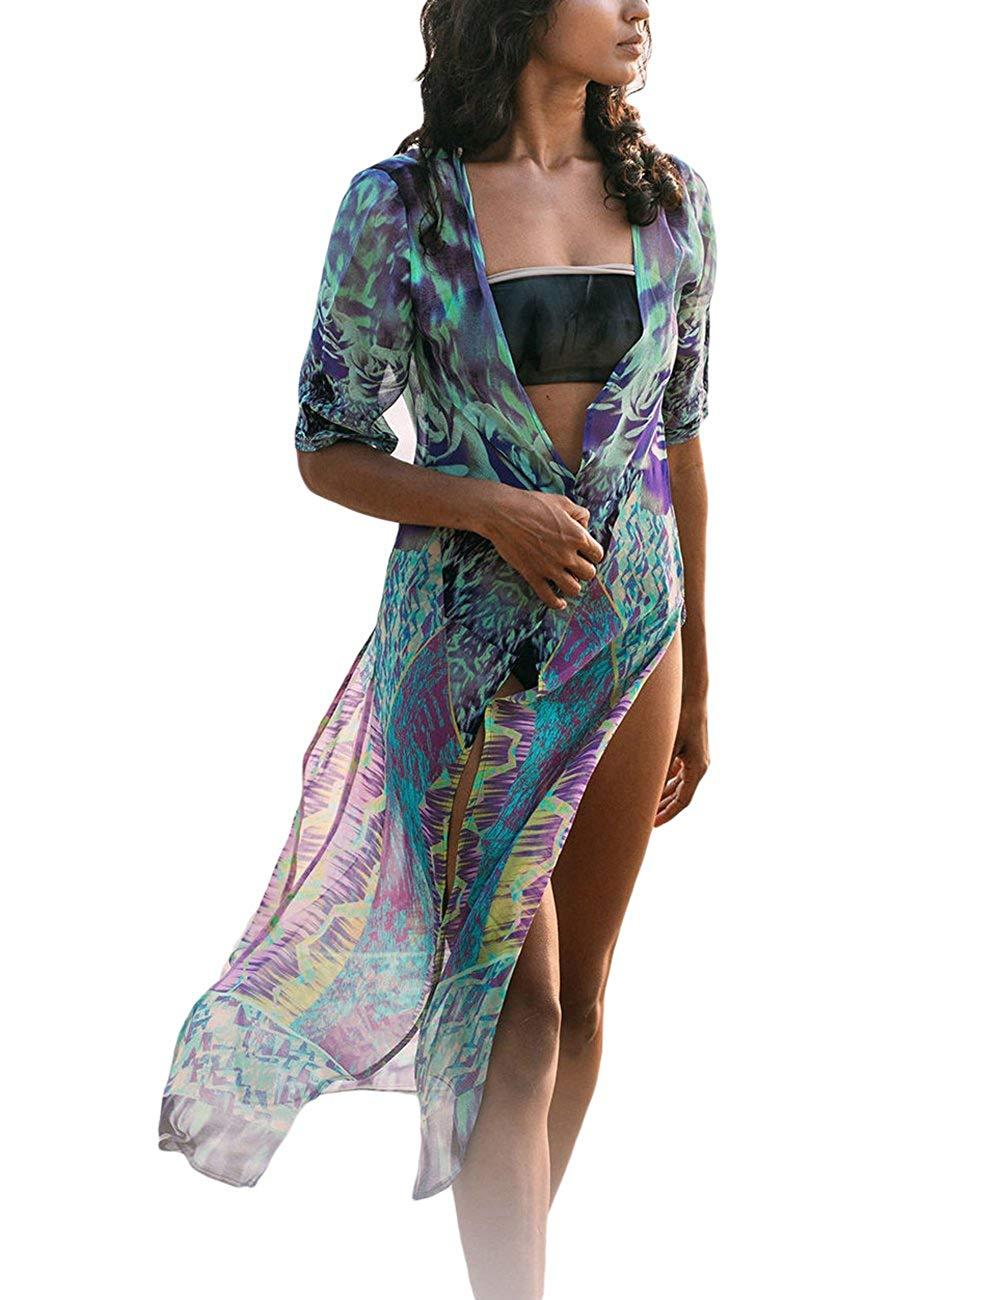 5219e6db74 Get Quotations · Bsubseach Womens Chiffon/Rayon Beach Blouses Kimono  Cardigan Long Bikini Cover Up